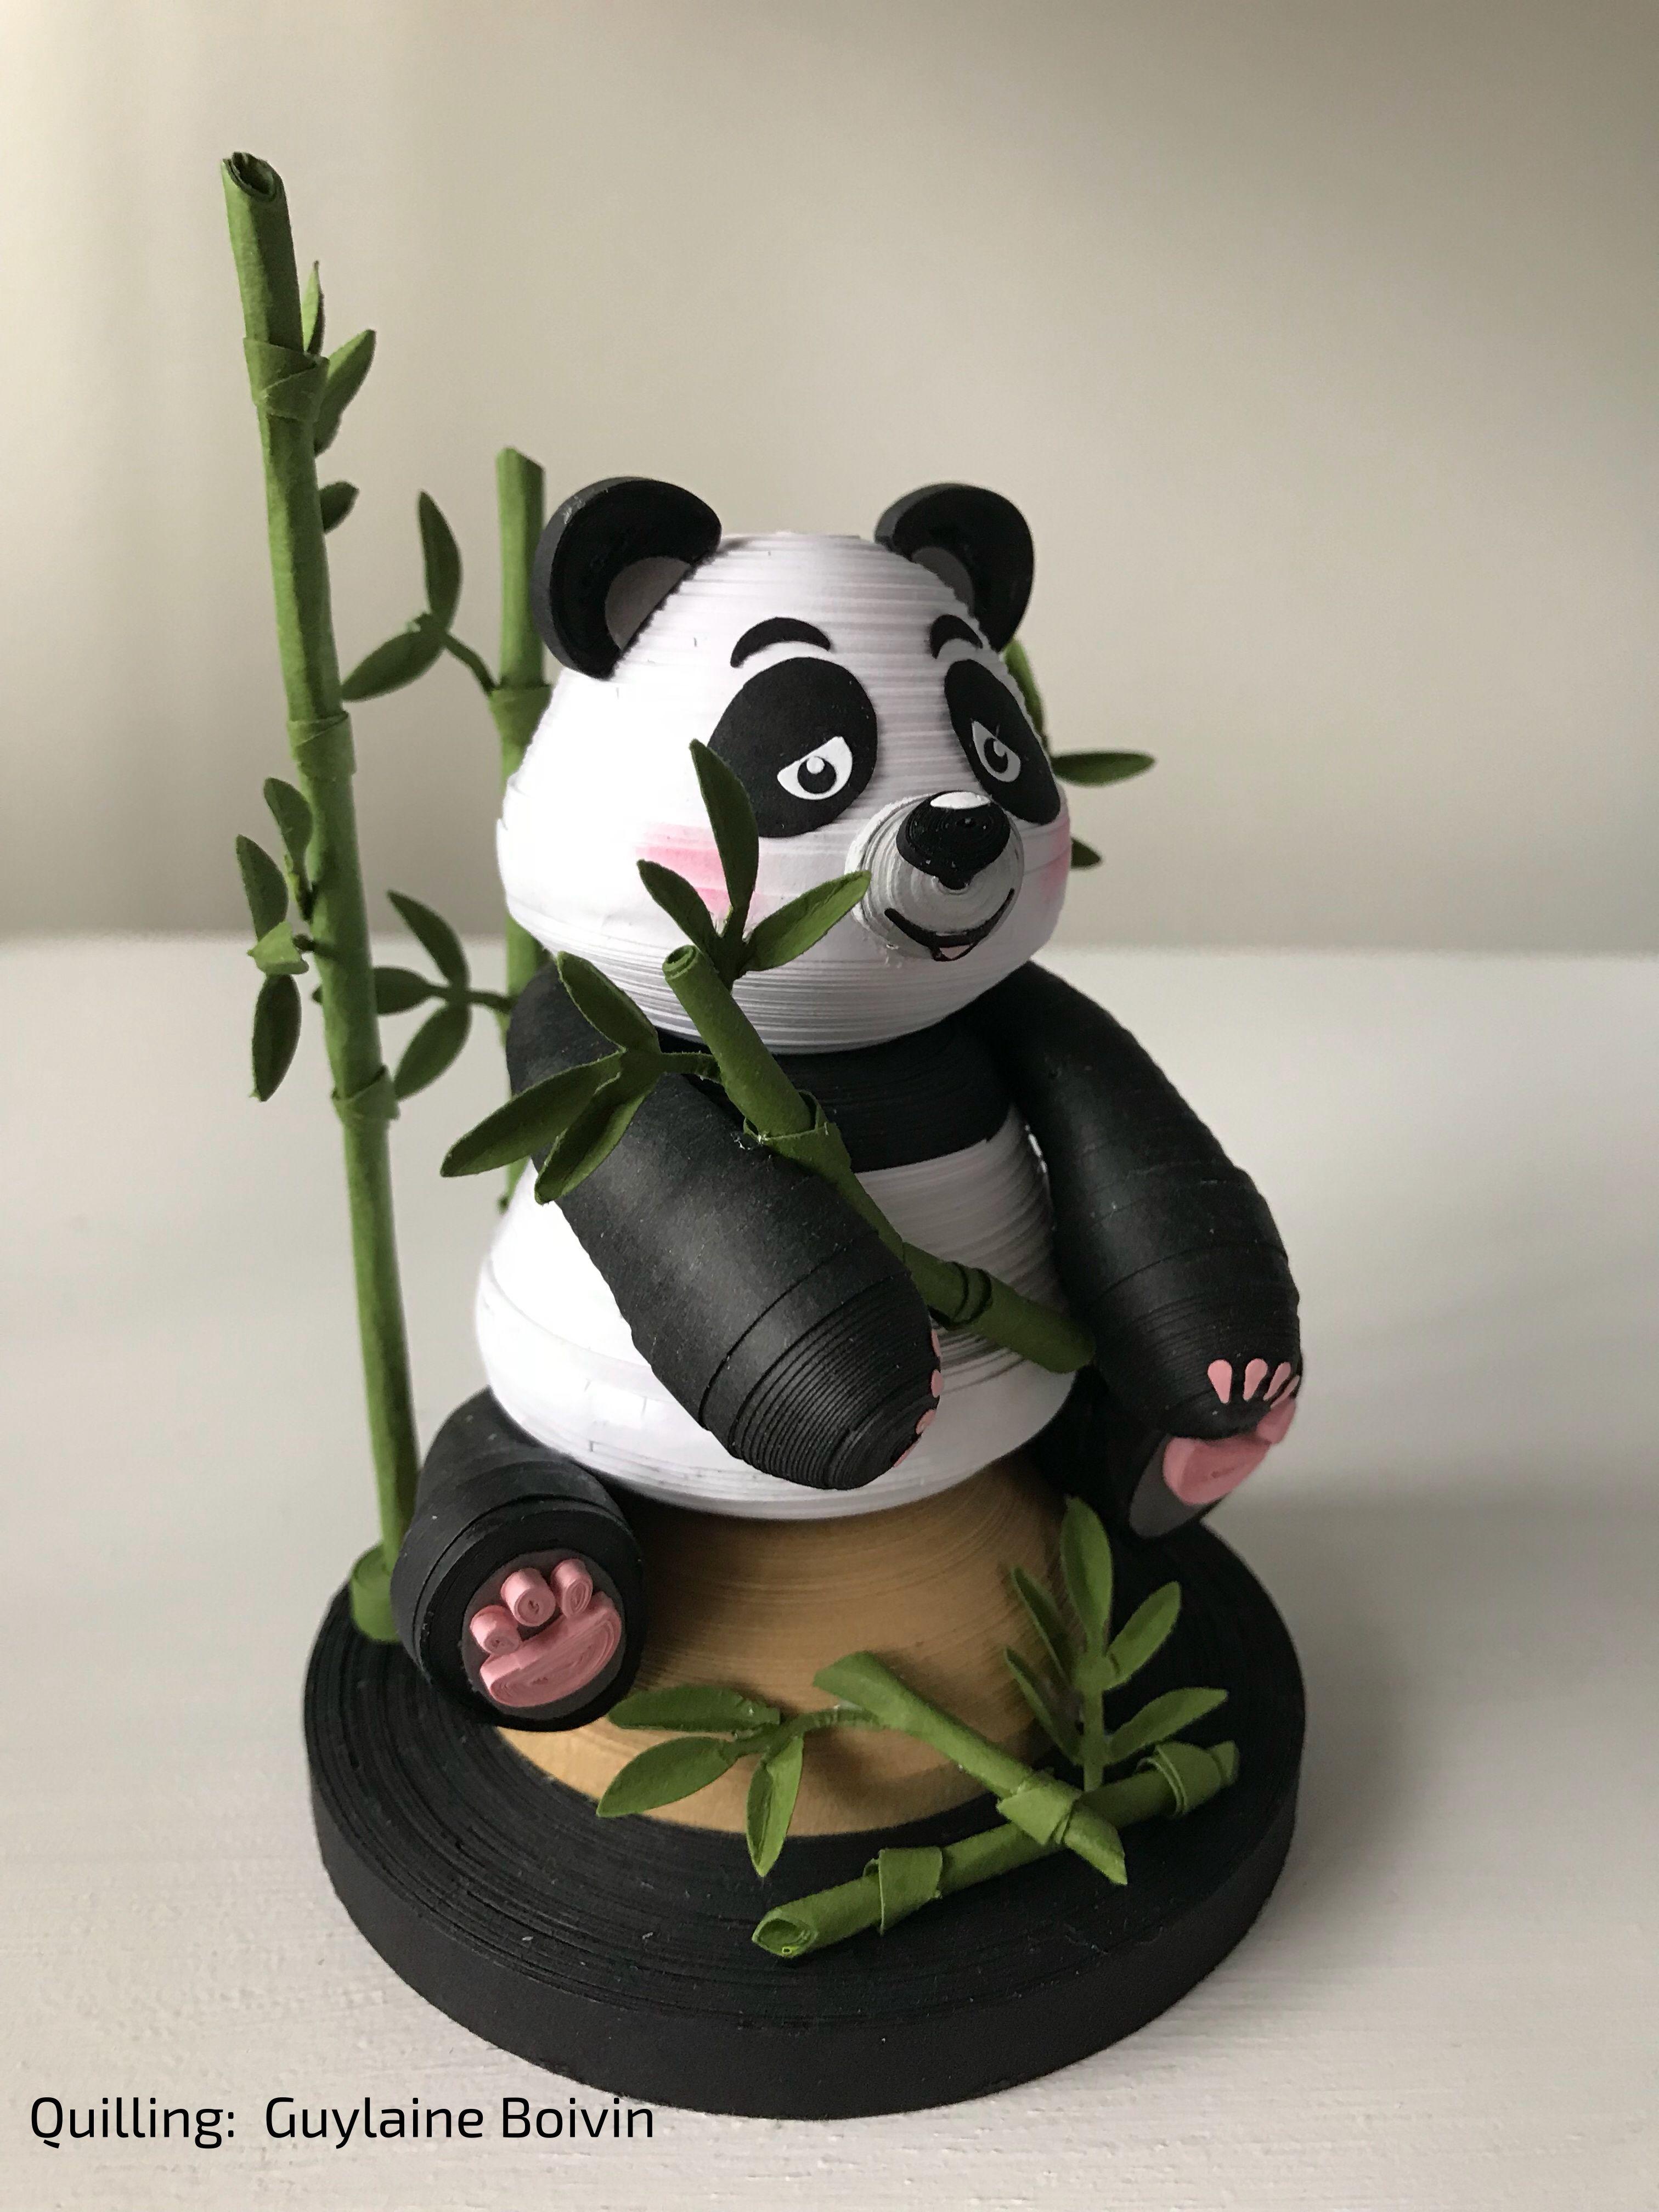 Quilling 3D Panda 112017 Quilling dolls, Quilling